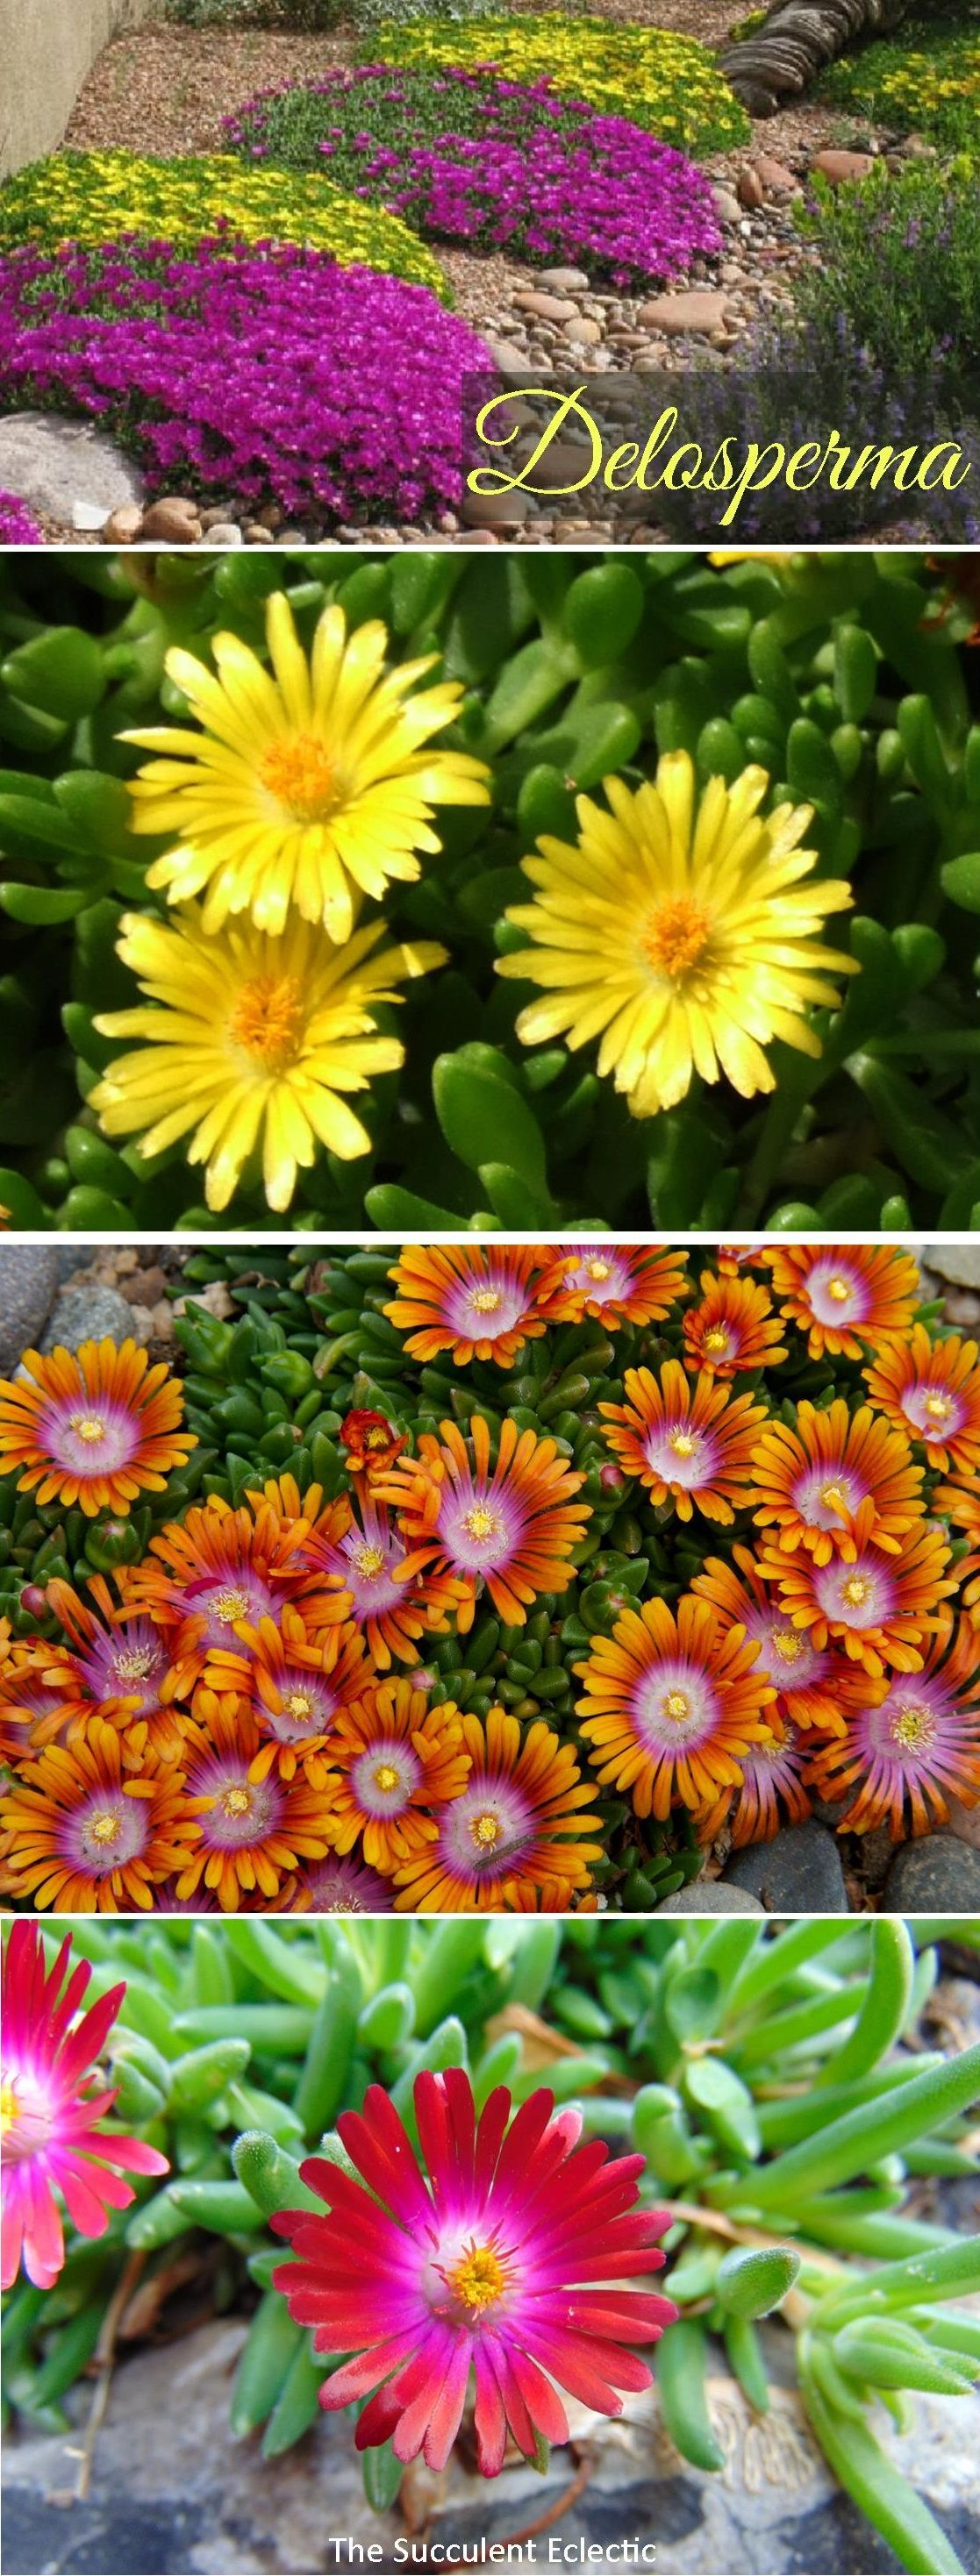 Species Spotlight Delosperma Hardy Ice Plant Plants Ice Plant Succulents